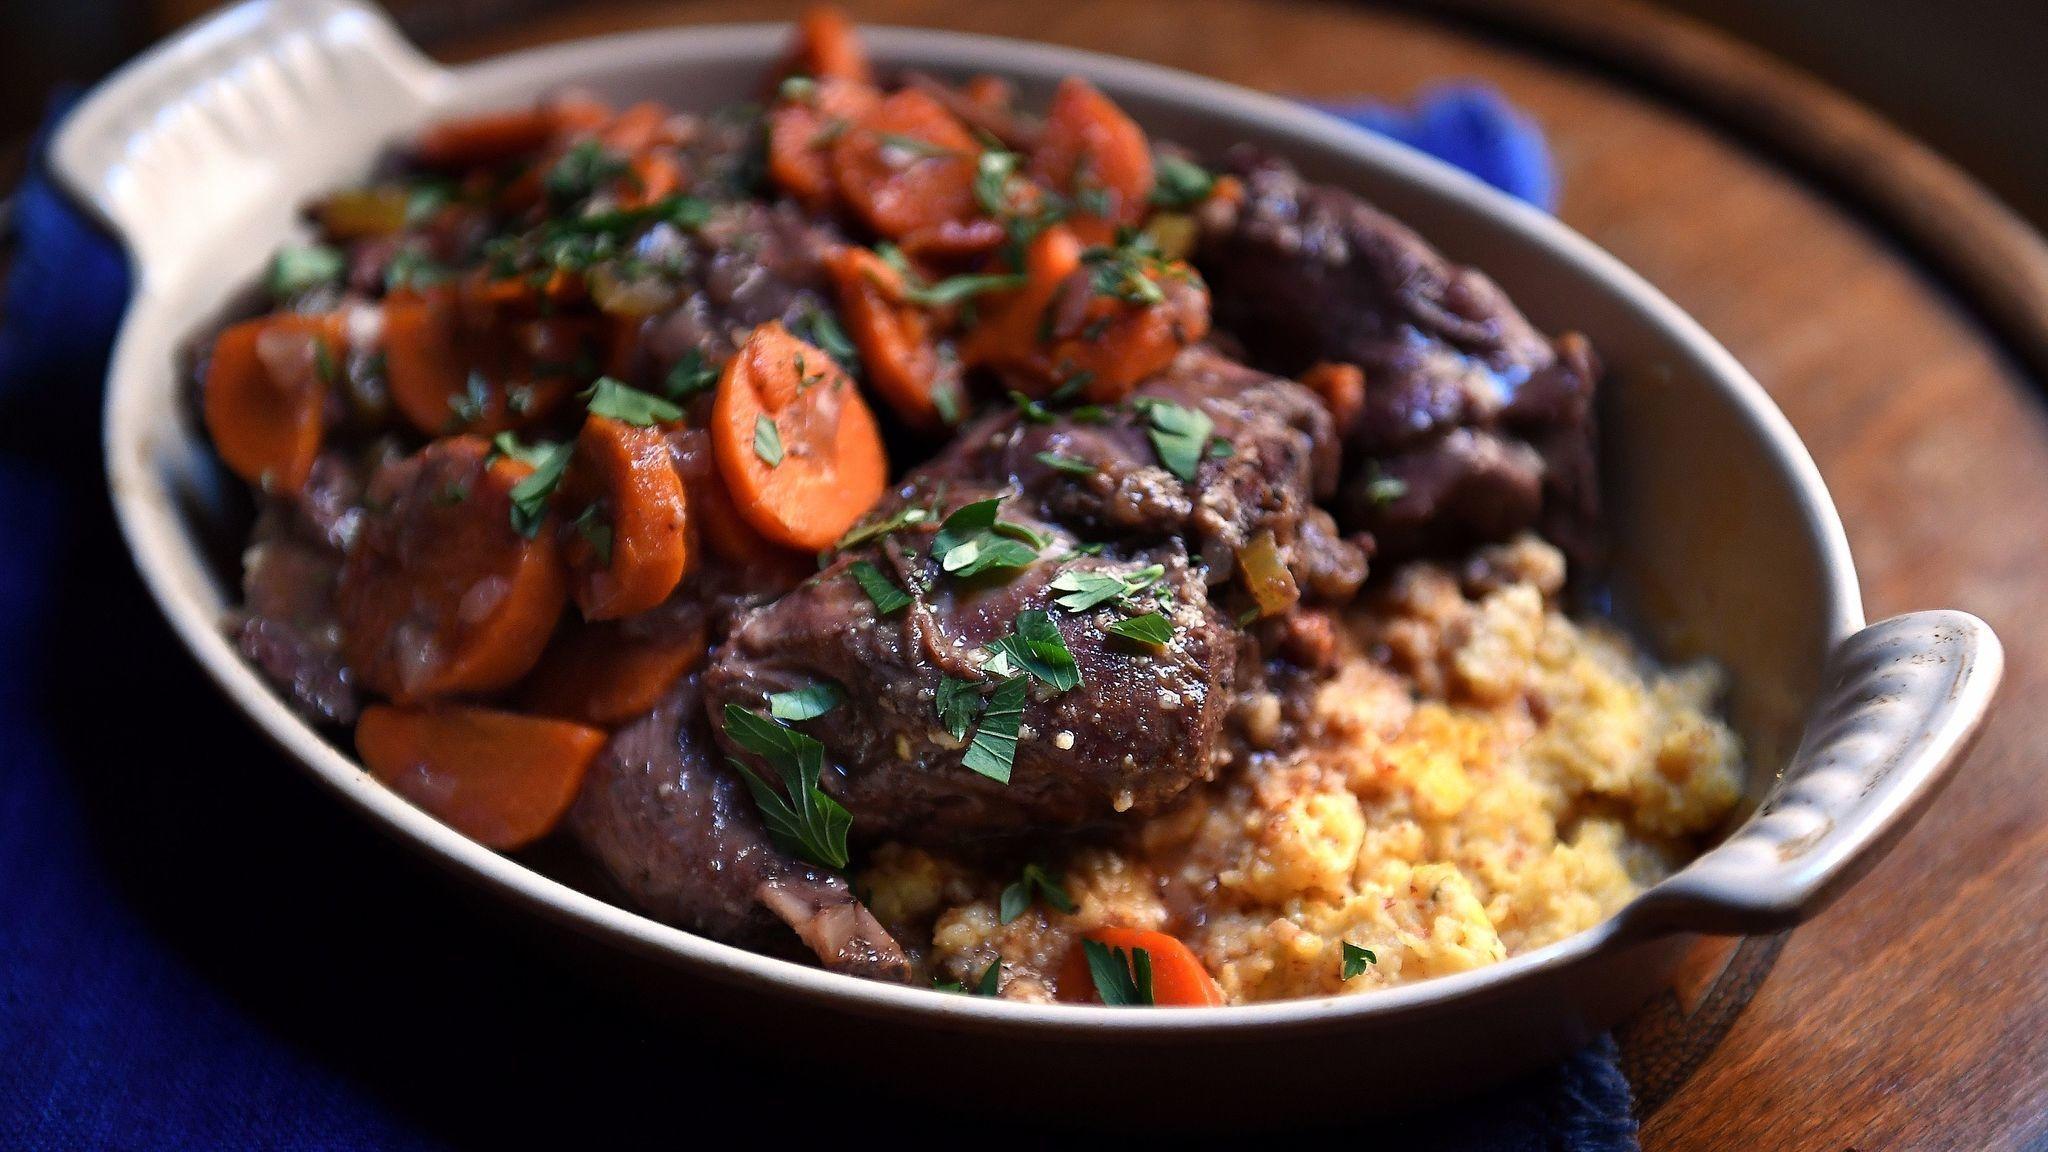 la-fo-daube-provencal-stew-recipes-20170107.jpg